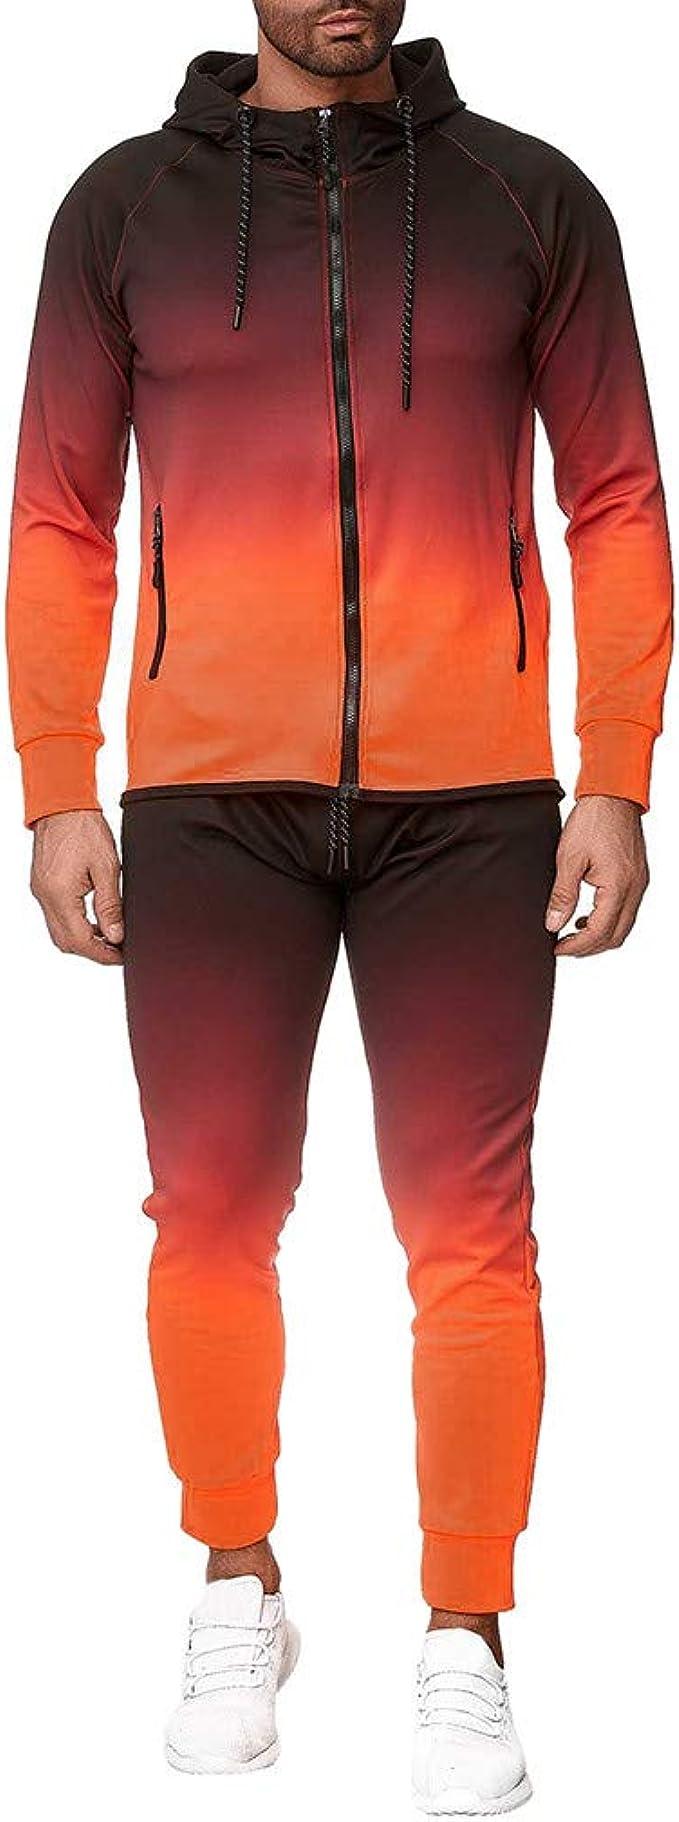 Sllowwa Herren Färben Jogging Anzug Trainingsanzug